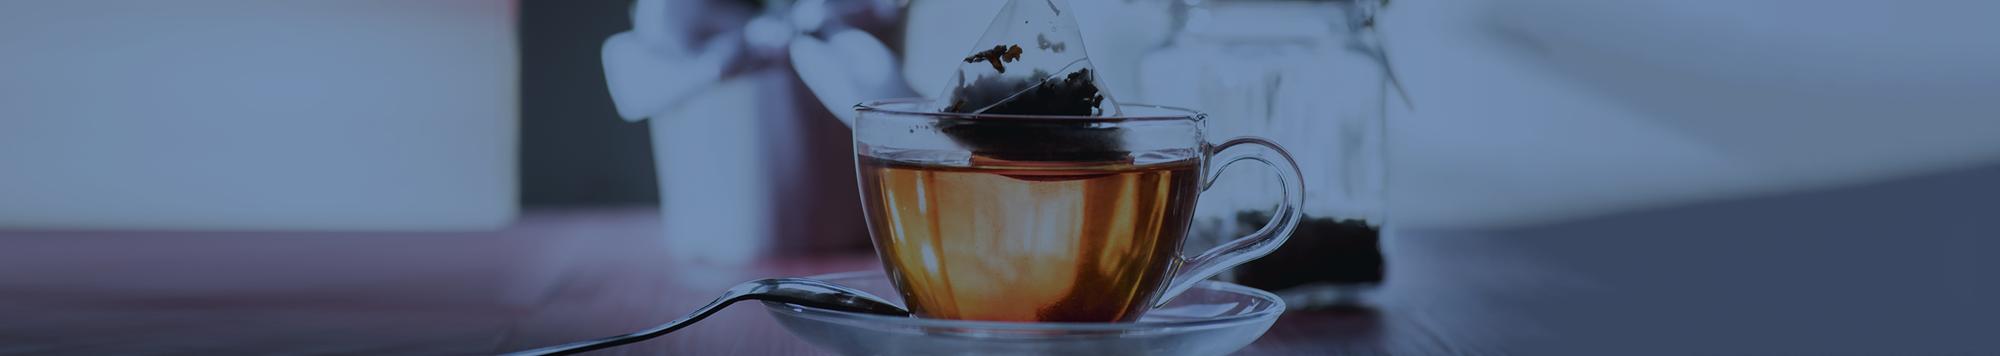 Cup of UCARI Tea